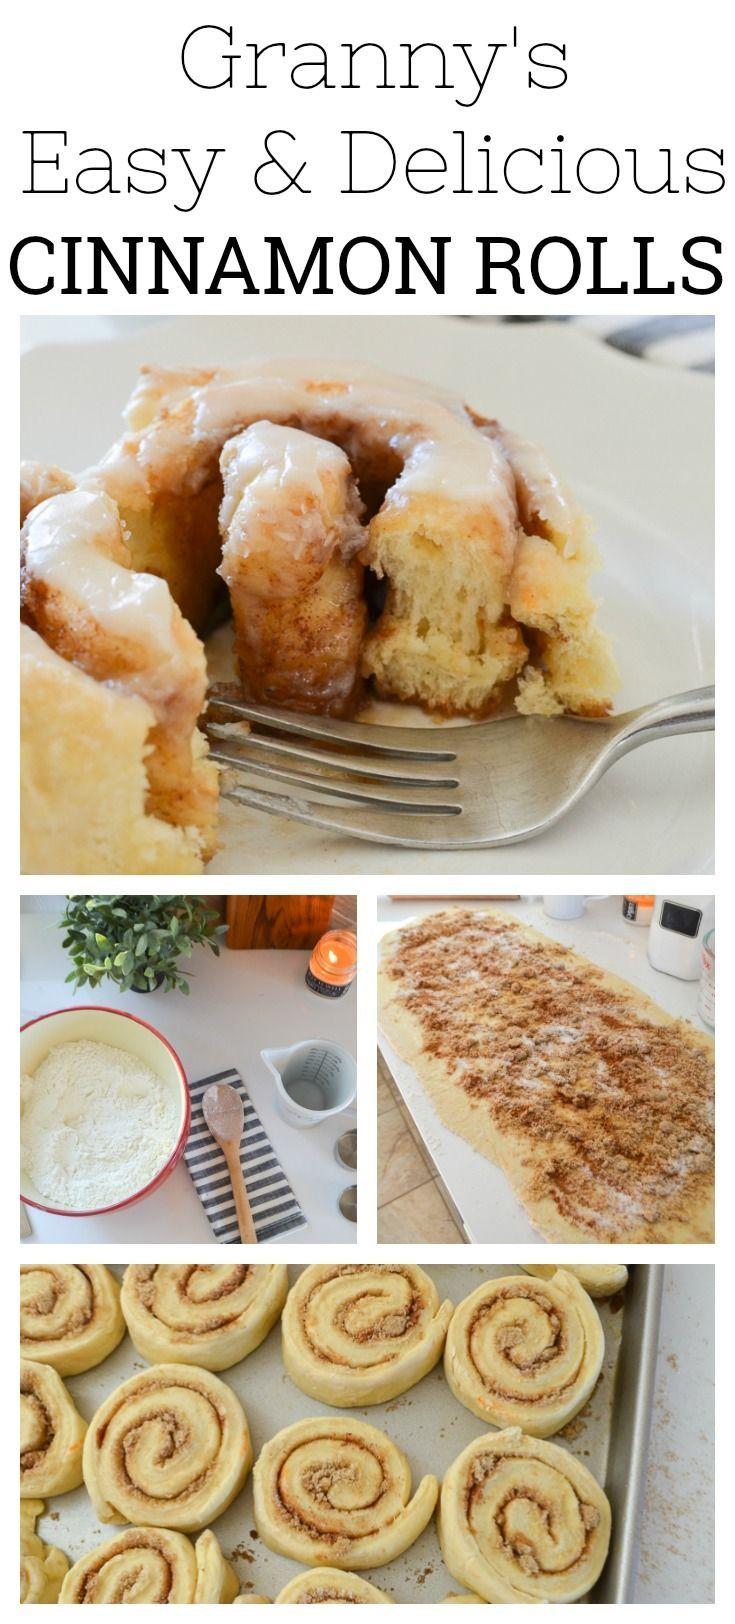 Granny's Easy and Delicious Cinnamon Rolls